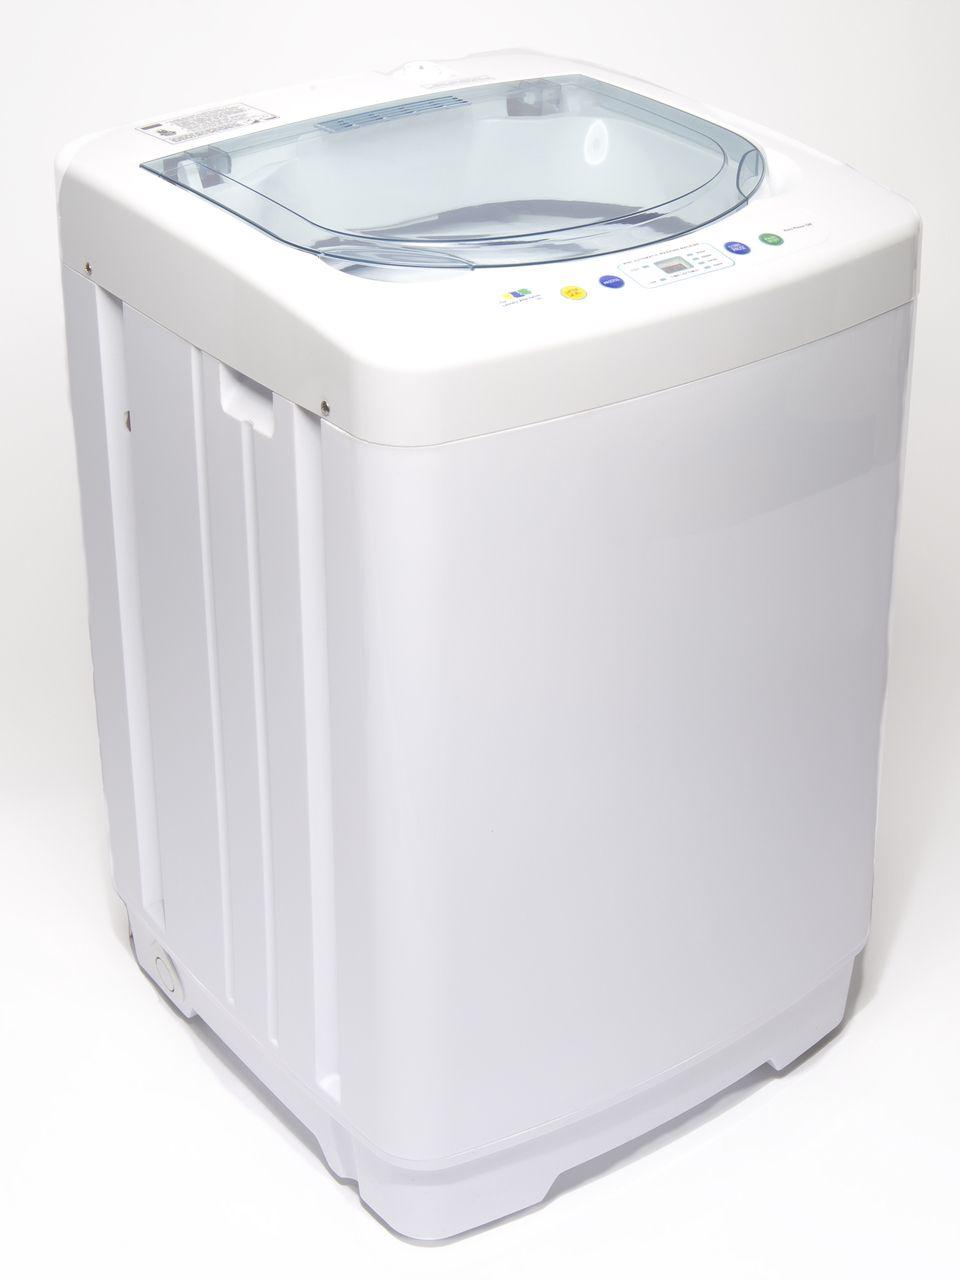 Super Compact Auto Washing Machine The Laundry Alternative